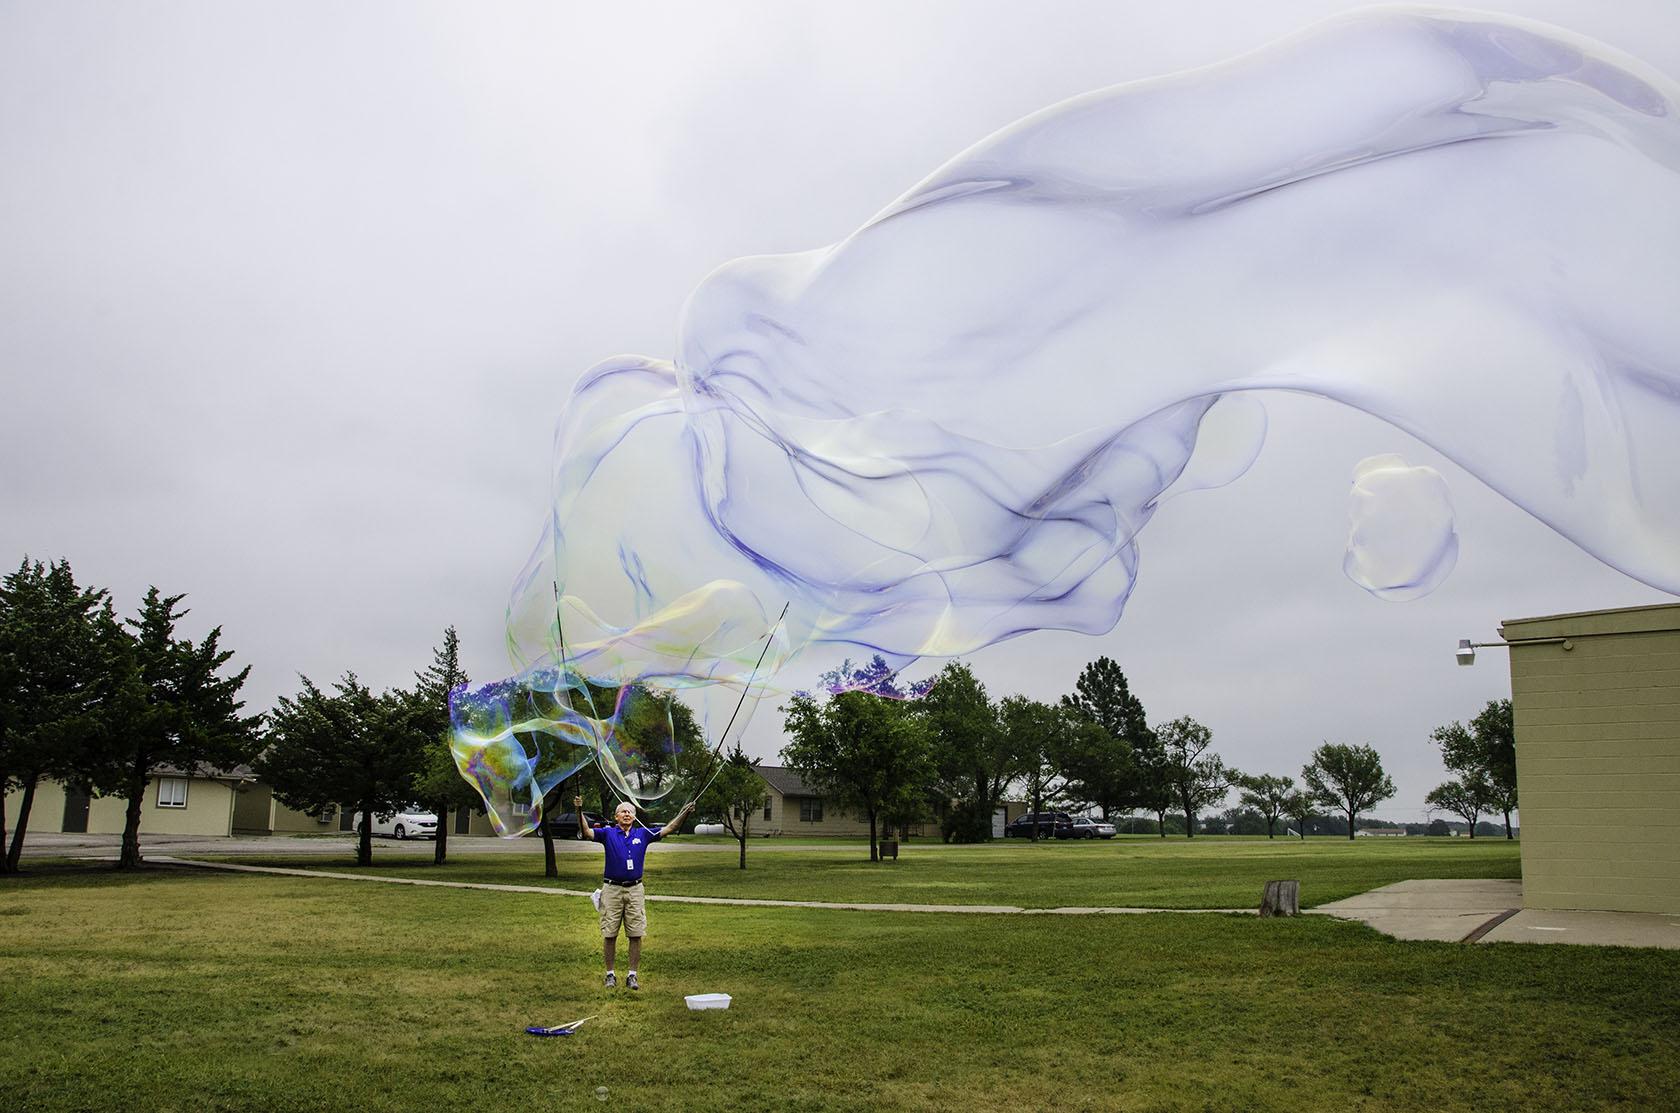 Big Bubble Wichita